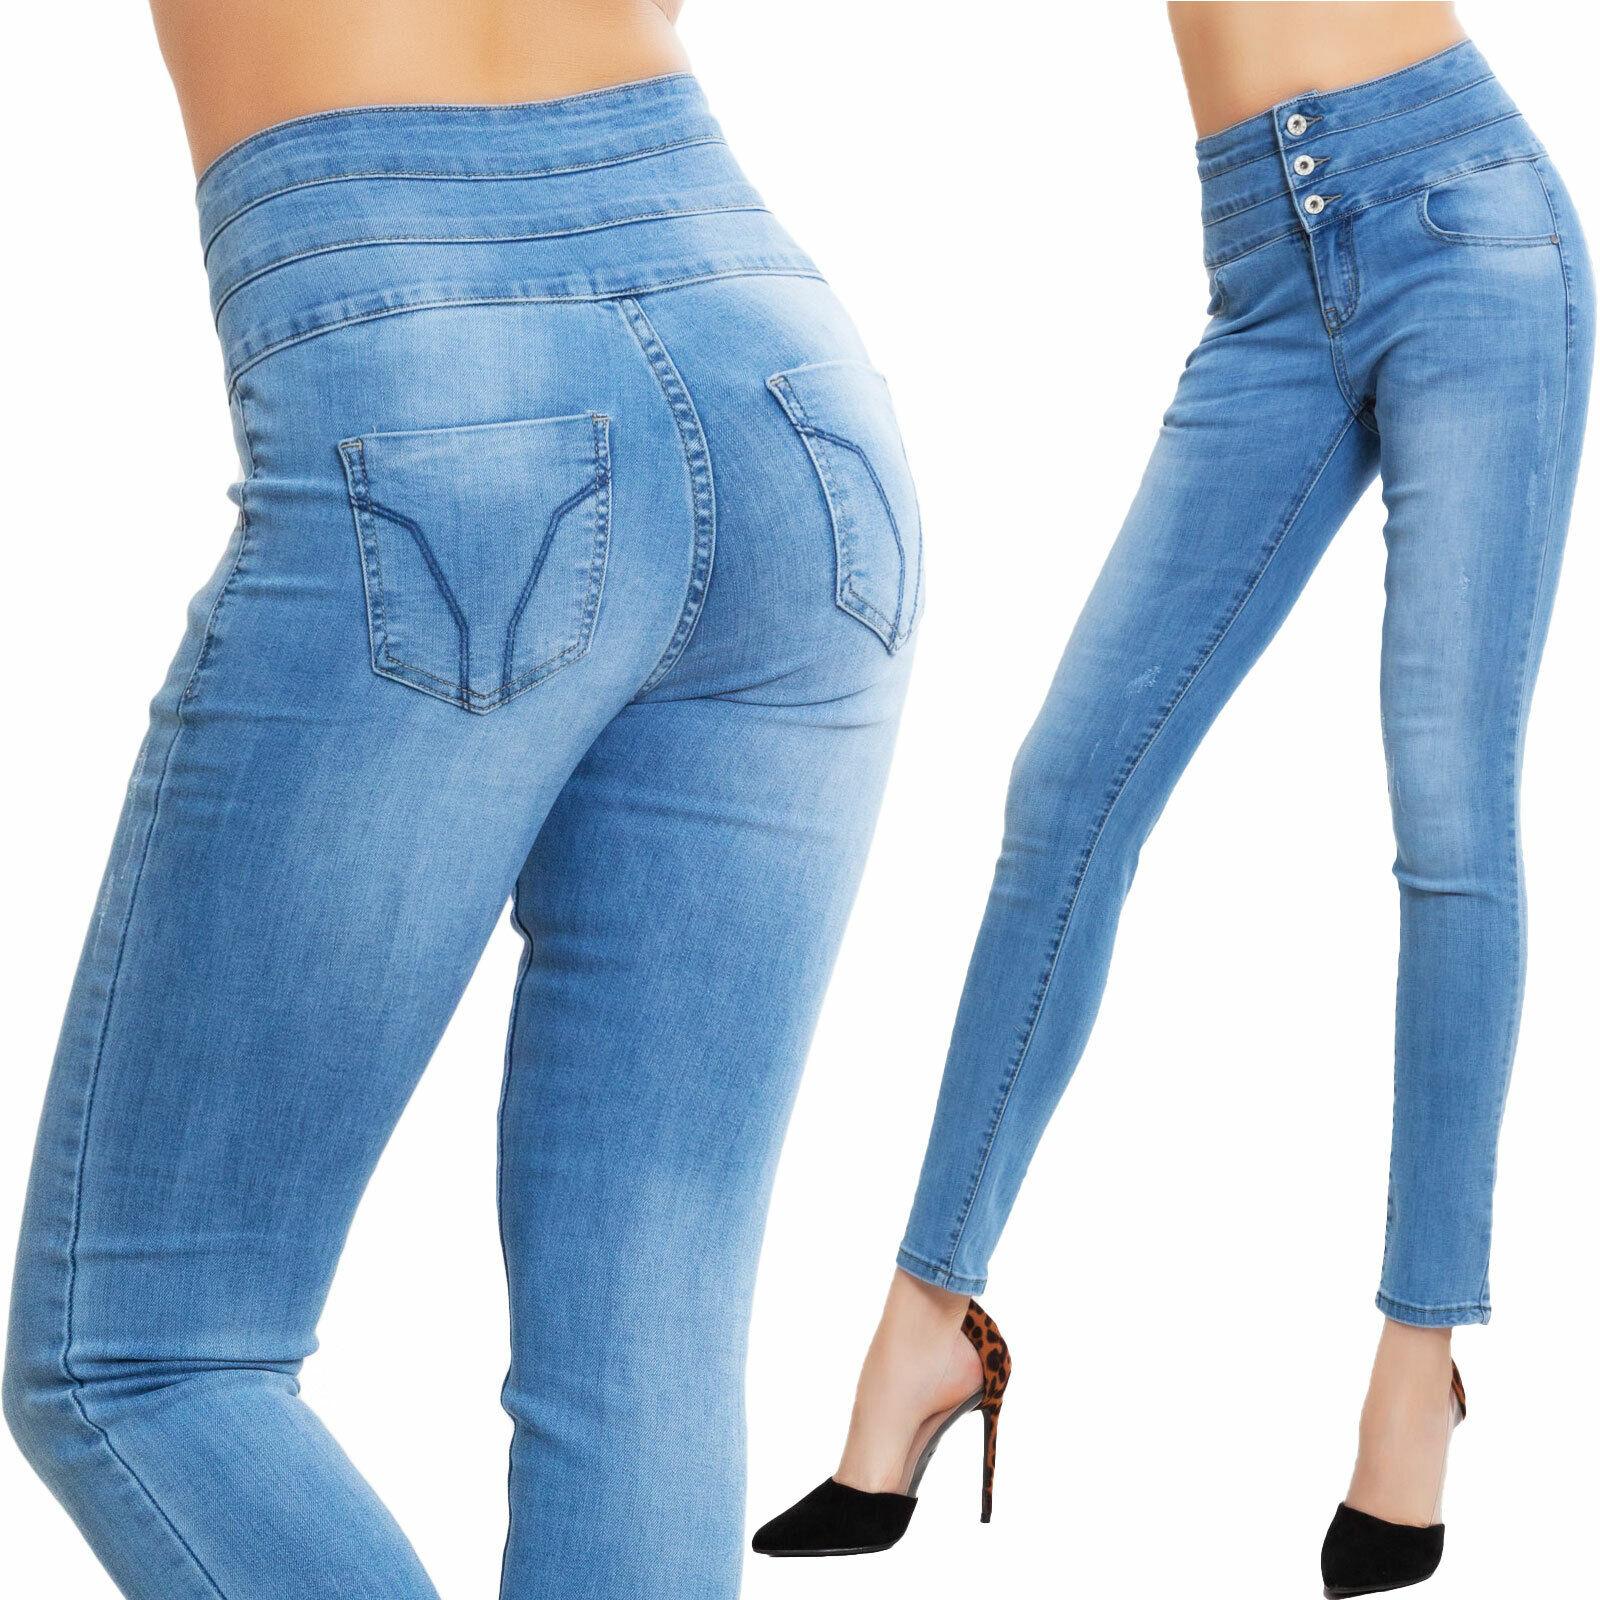 KOUCLA highwaist jeans skinny donna pantaloni jeans con cintura